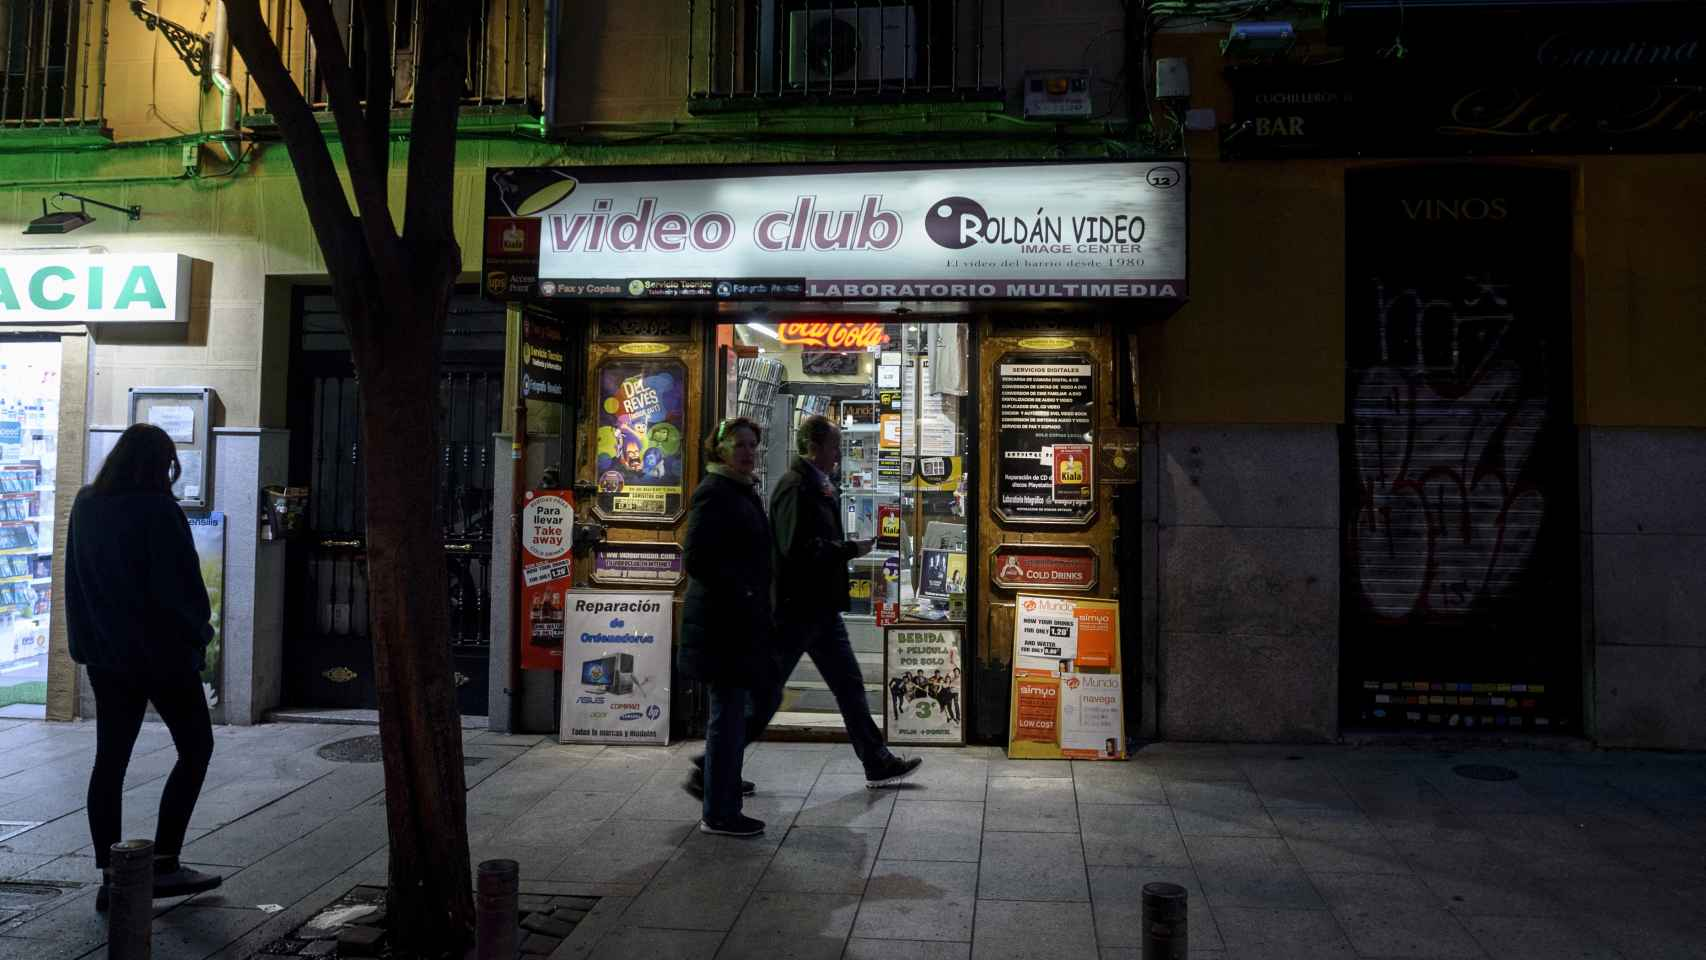 Videoclub Rafael Roldán en Madrid